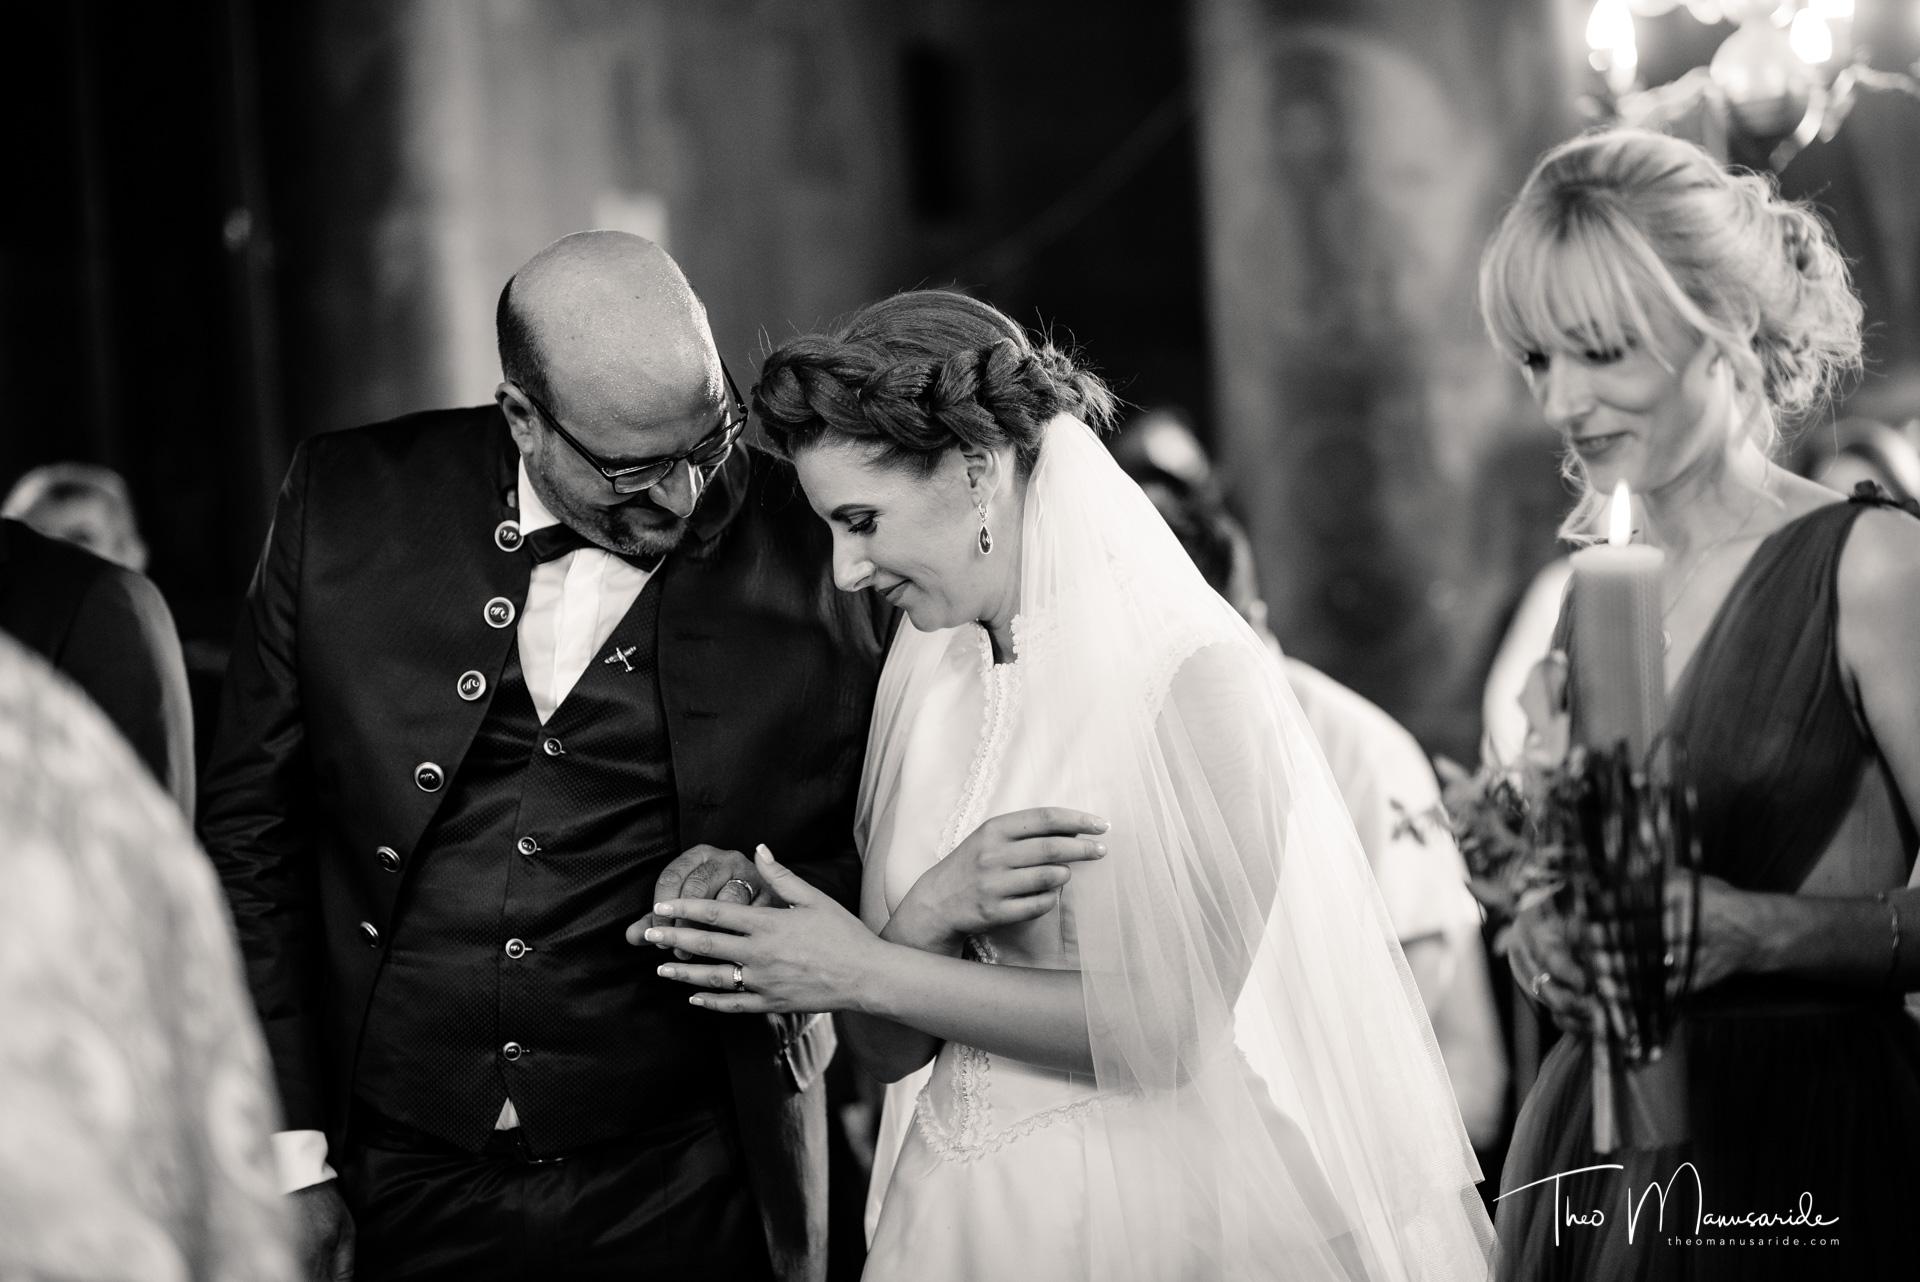 fotograf-nunta-domeniul-manasia-26